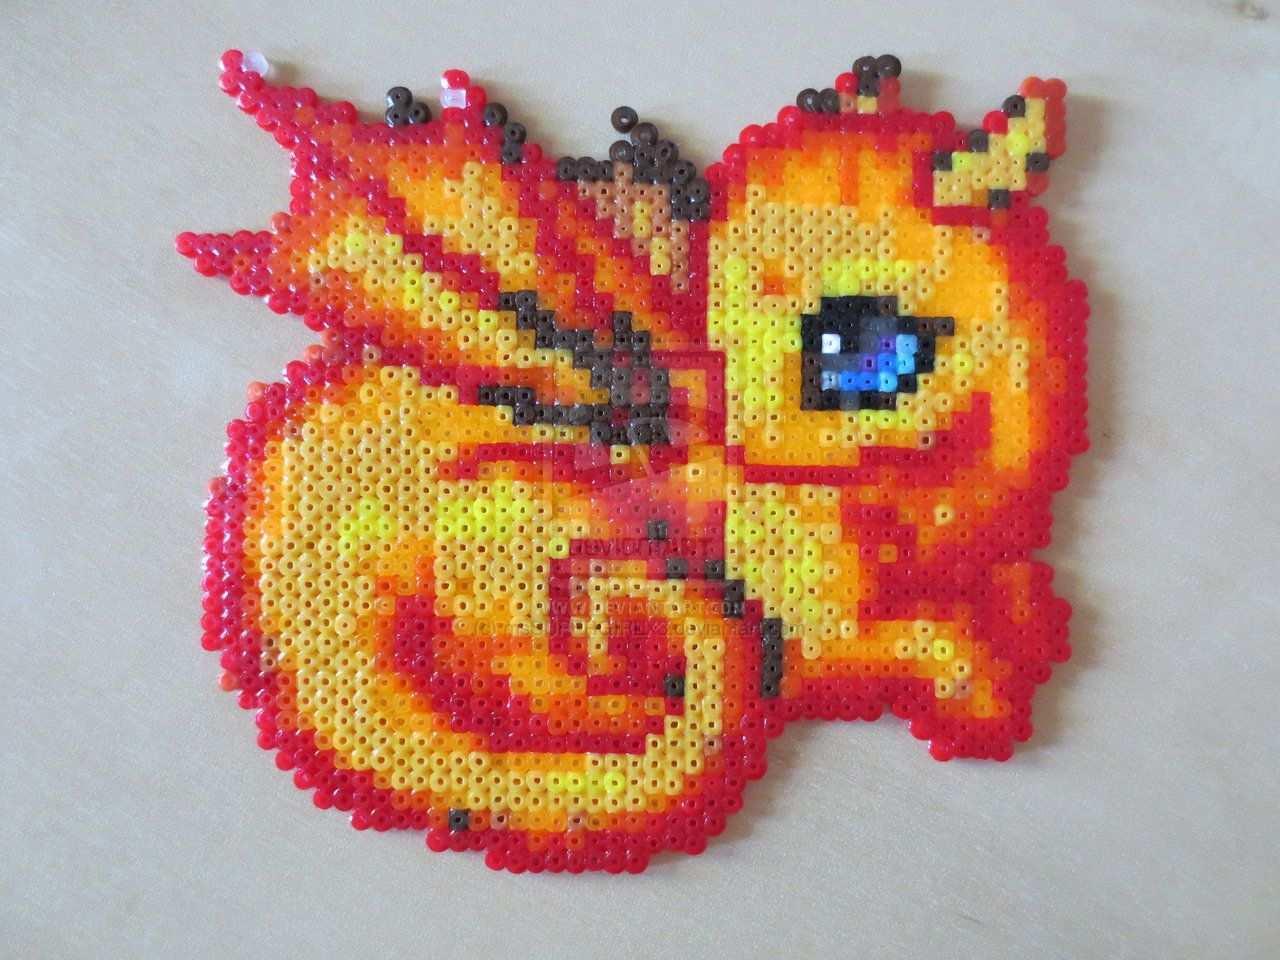 Baby Dragon By Mssupergirlx3 On Deviantart Perler Crafts Diy Perler Beads Perler Bead Templates